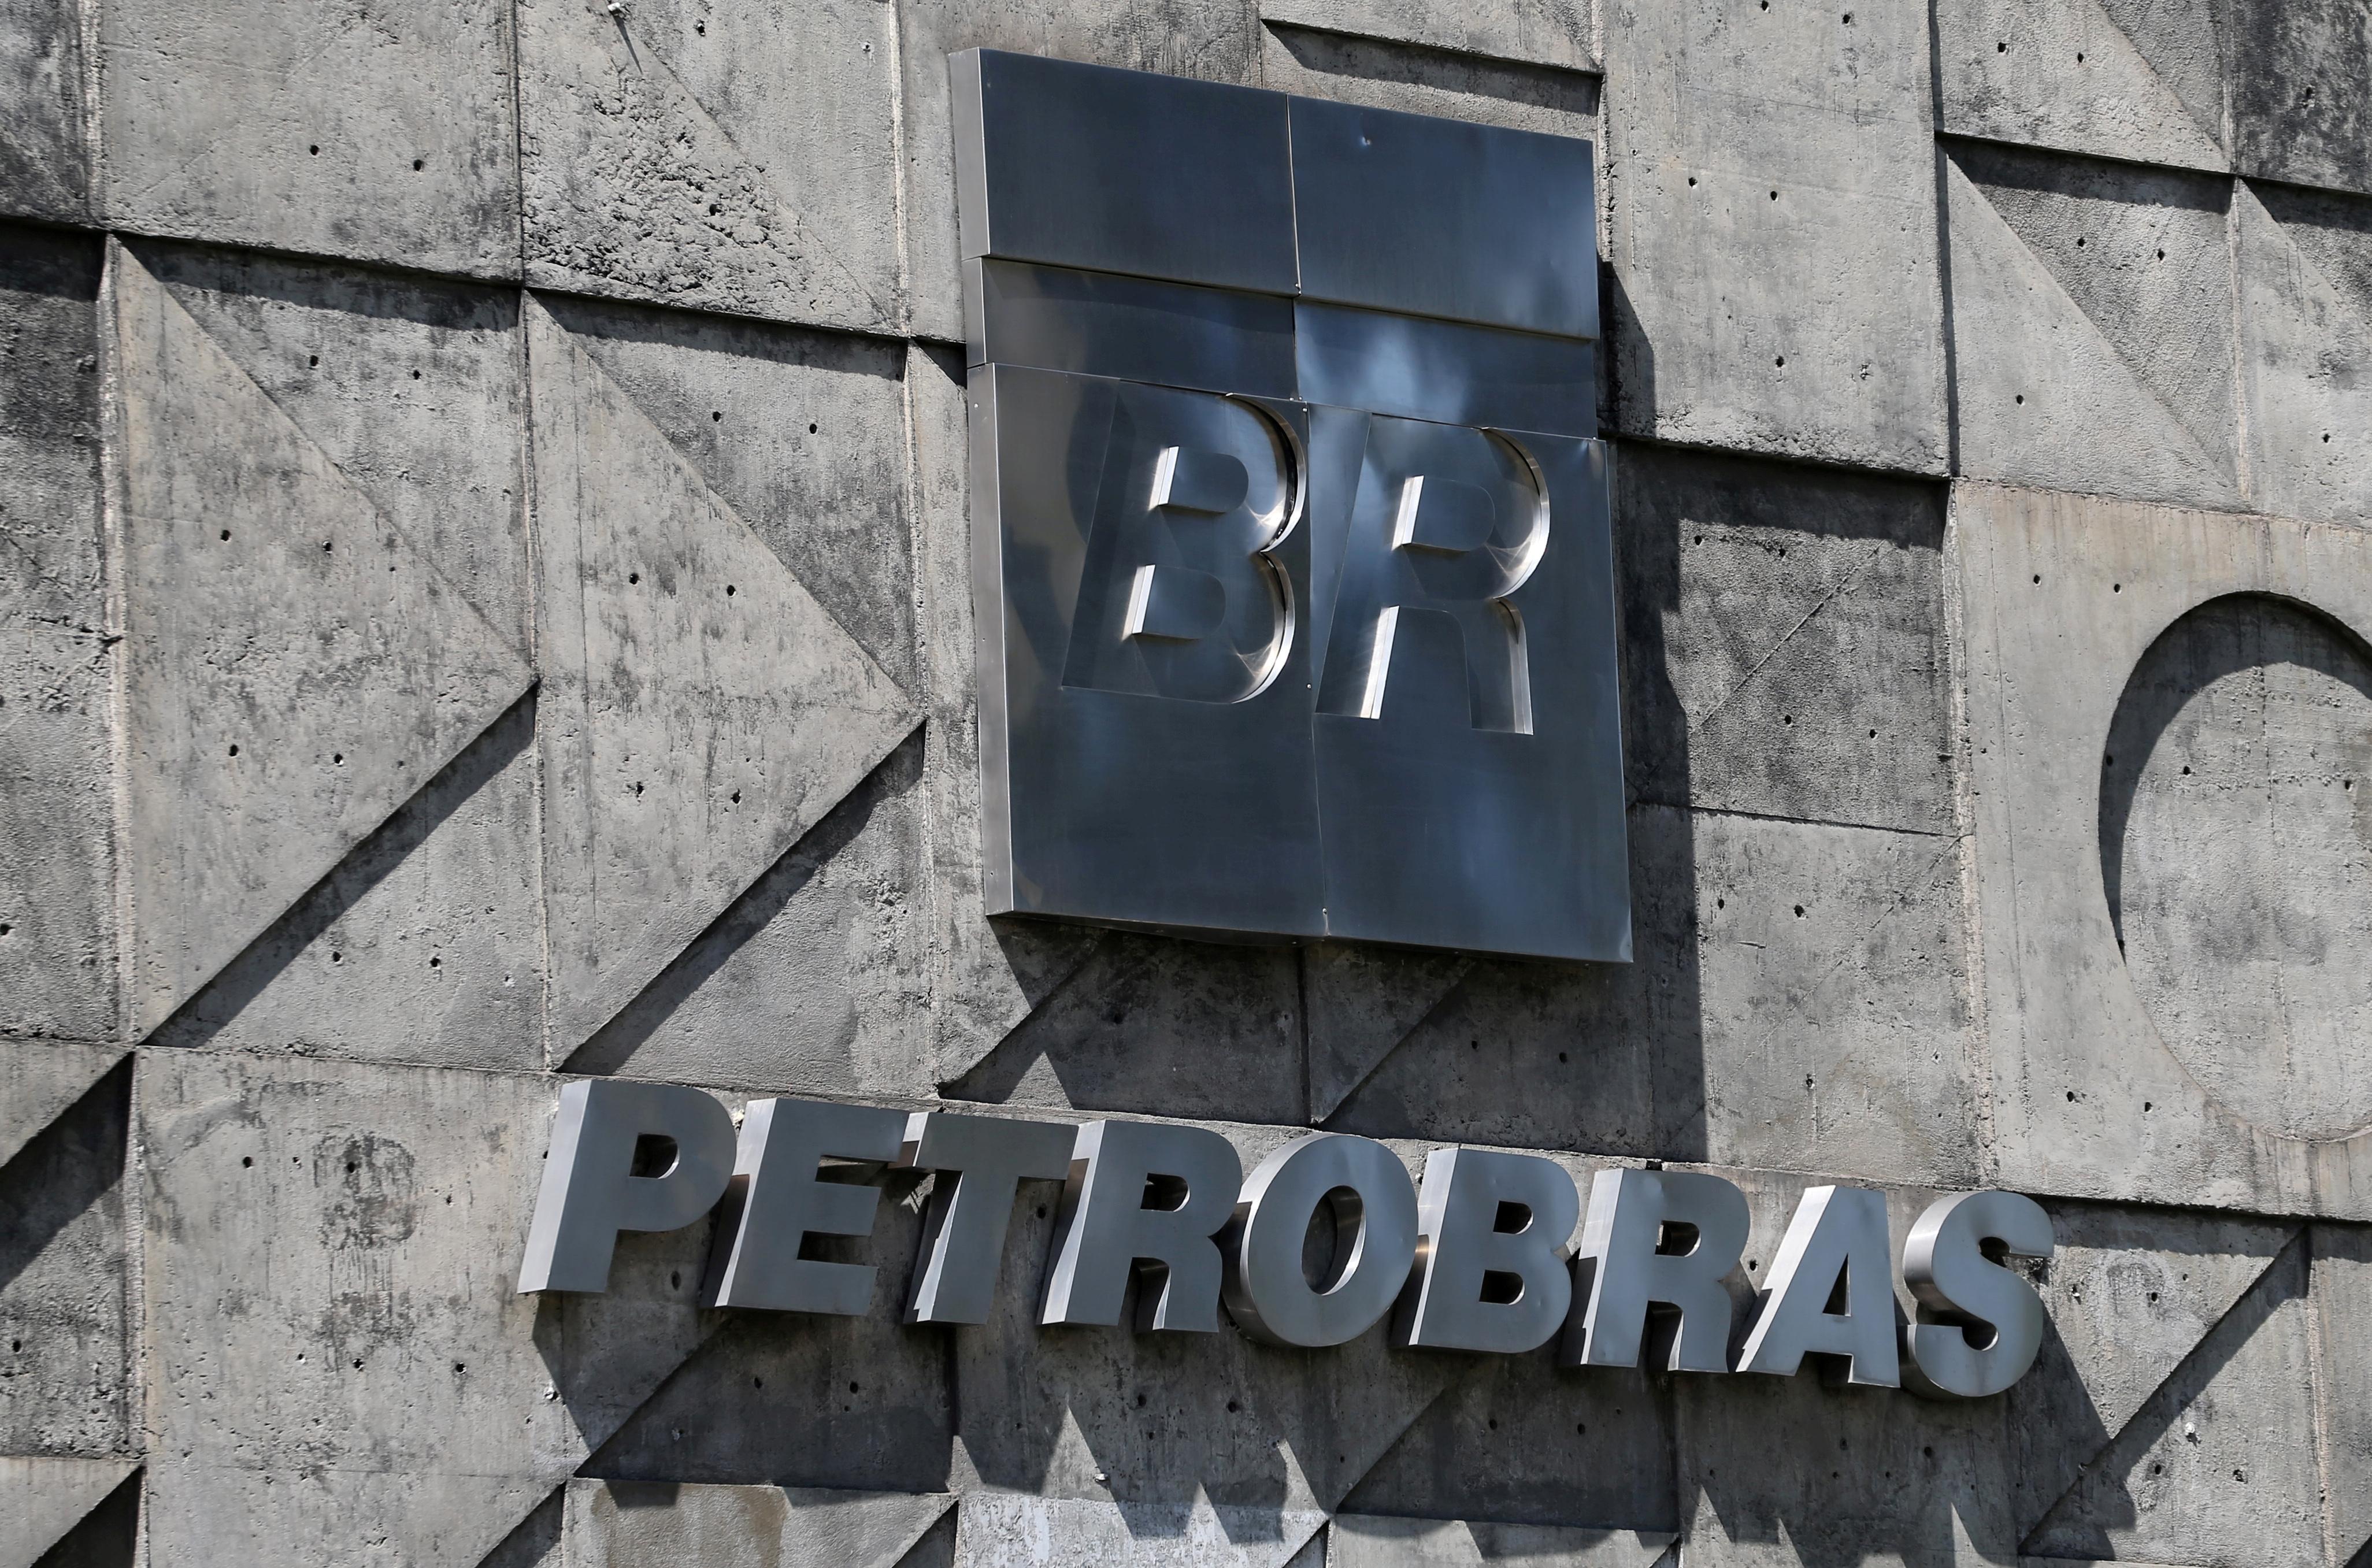 Exclusive: Brazil's Petrobras refineries sale lures trading companies, PetroChina, Saudi Aramco - sources